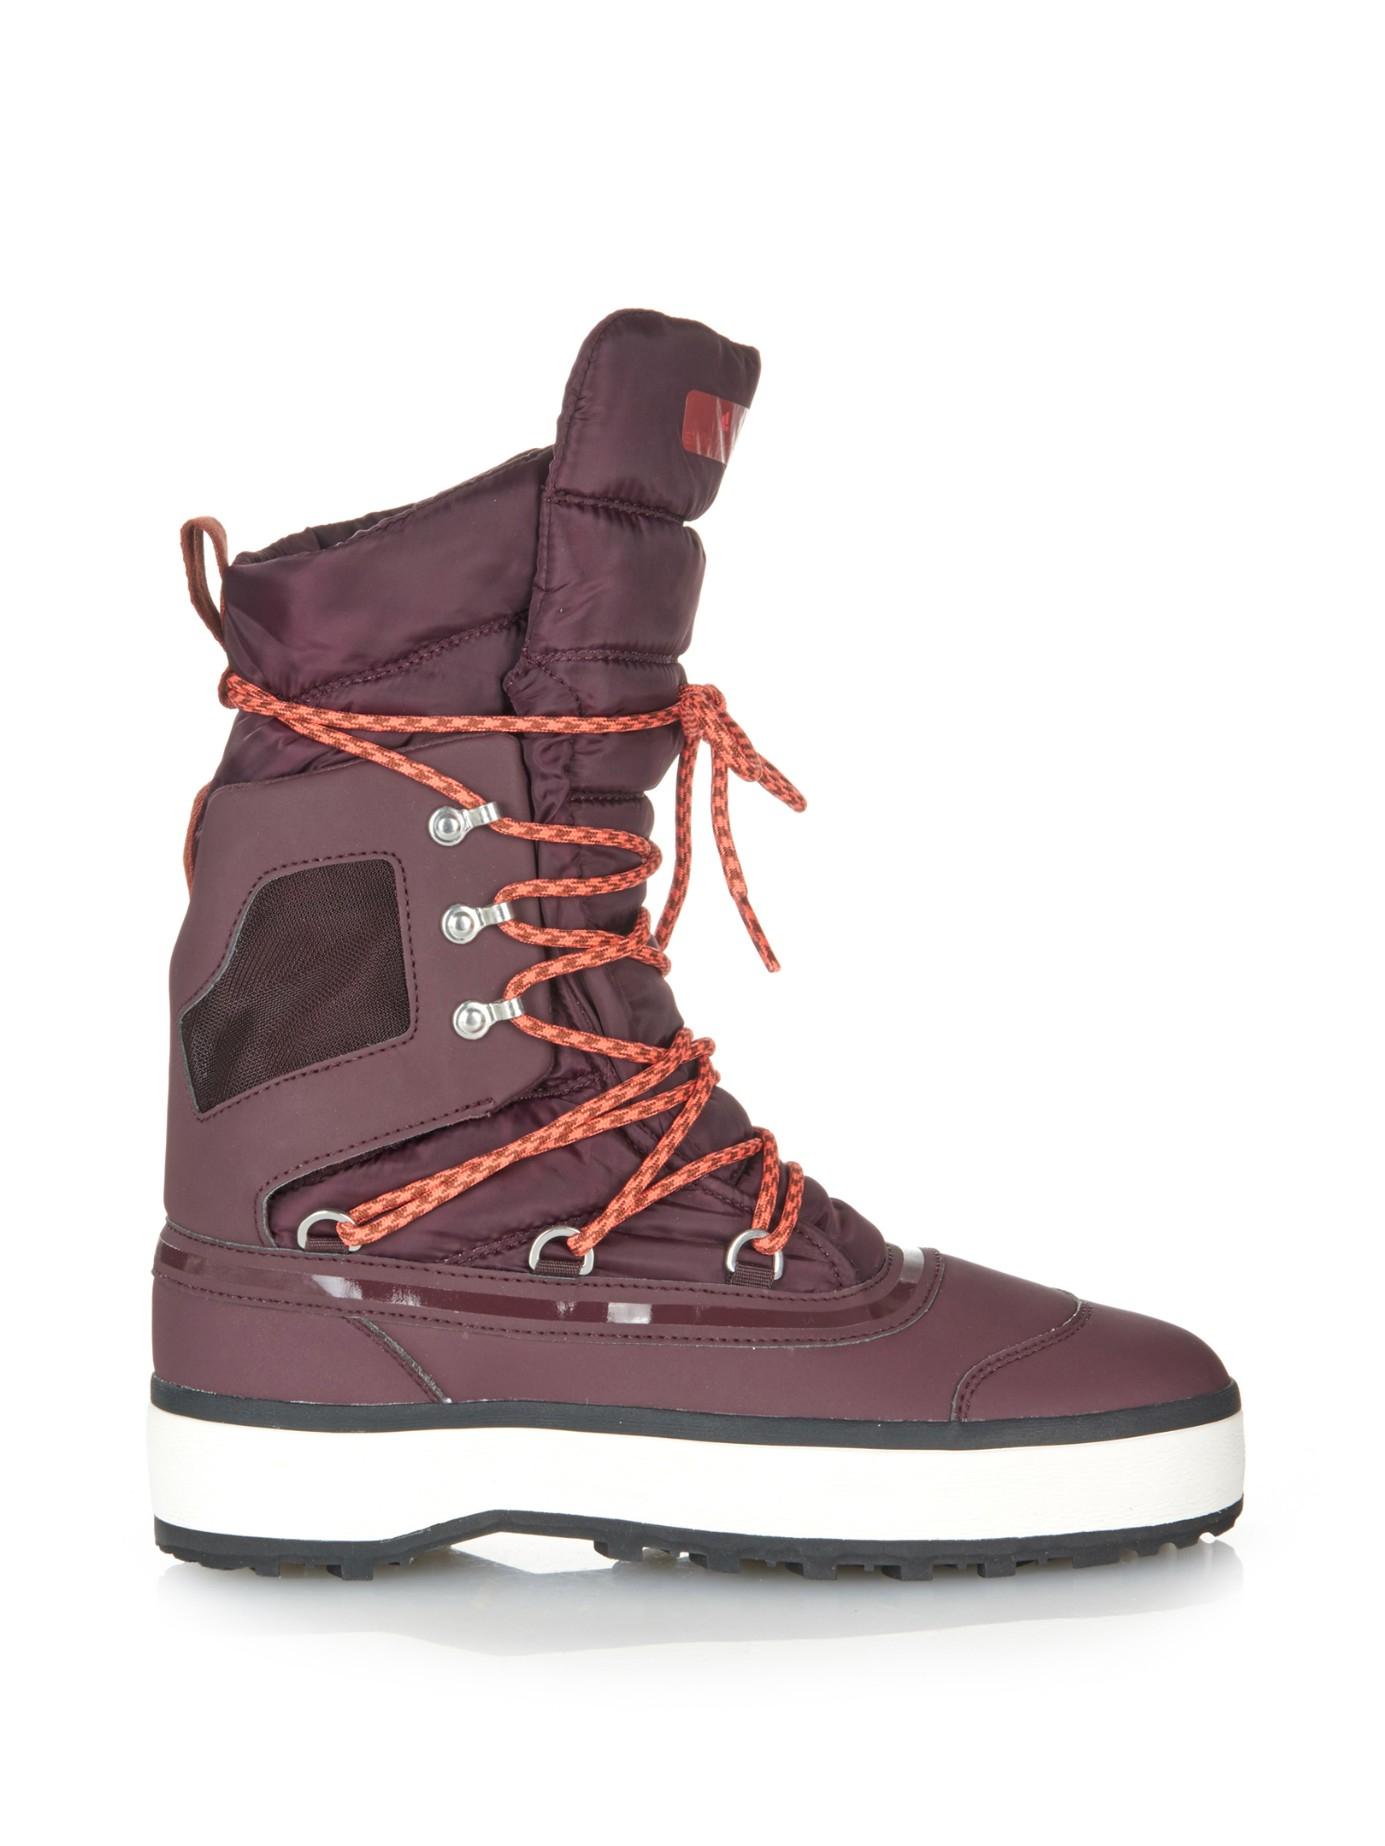 Adidas By Stella Mccartney Nangator Snow Boots In Purple